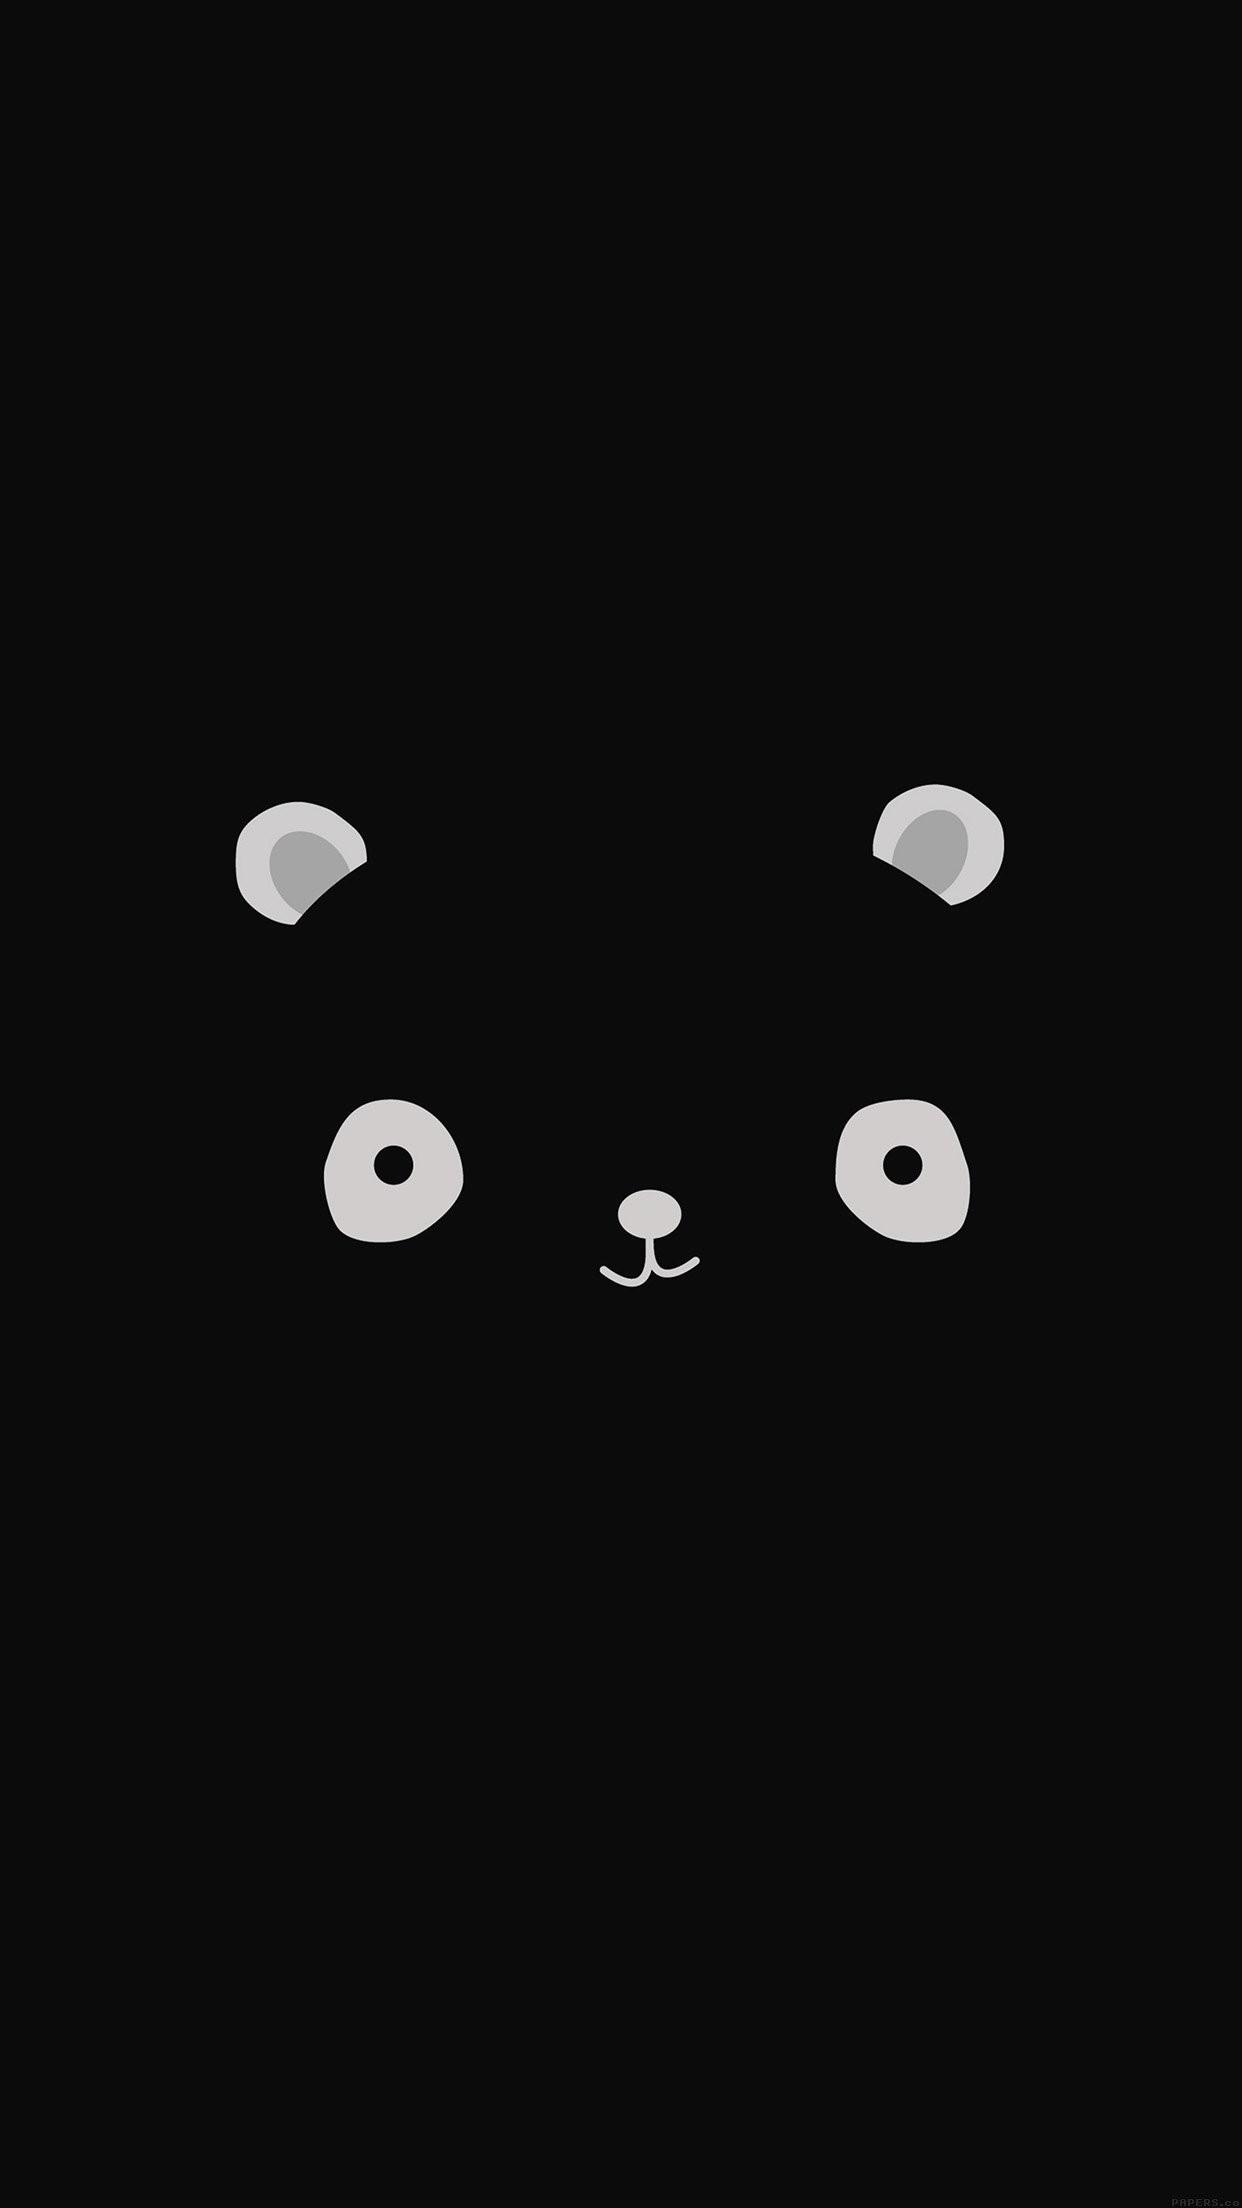 Iphone Cute Black Wallpapers Wallpaper Cave